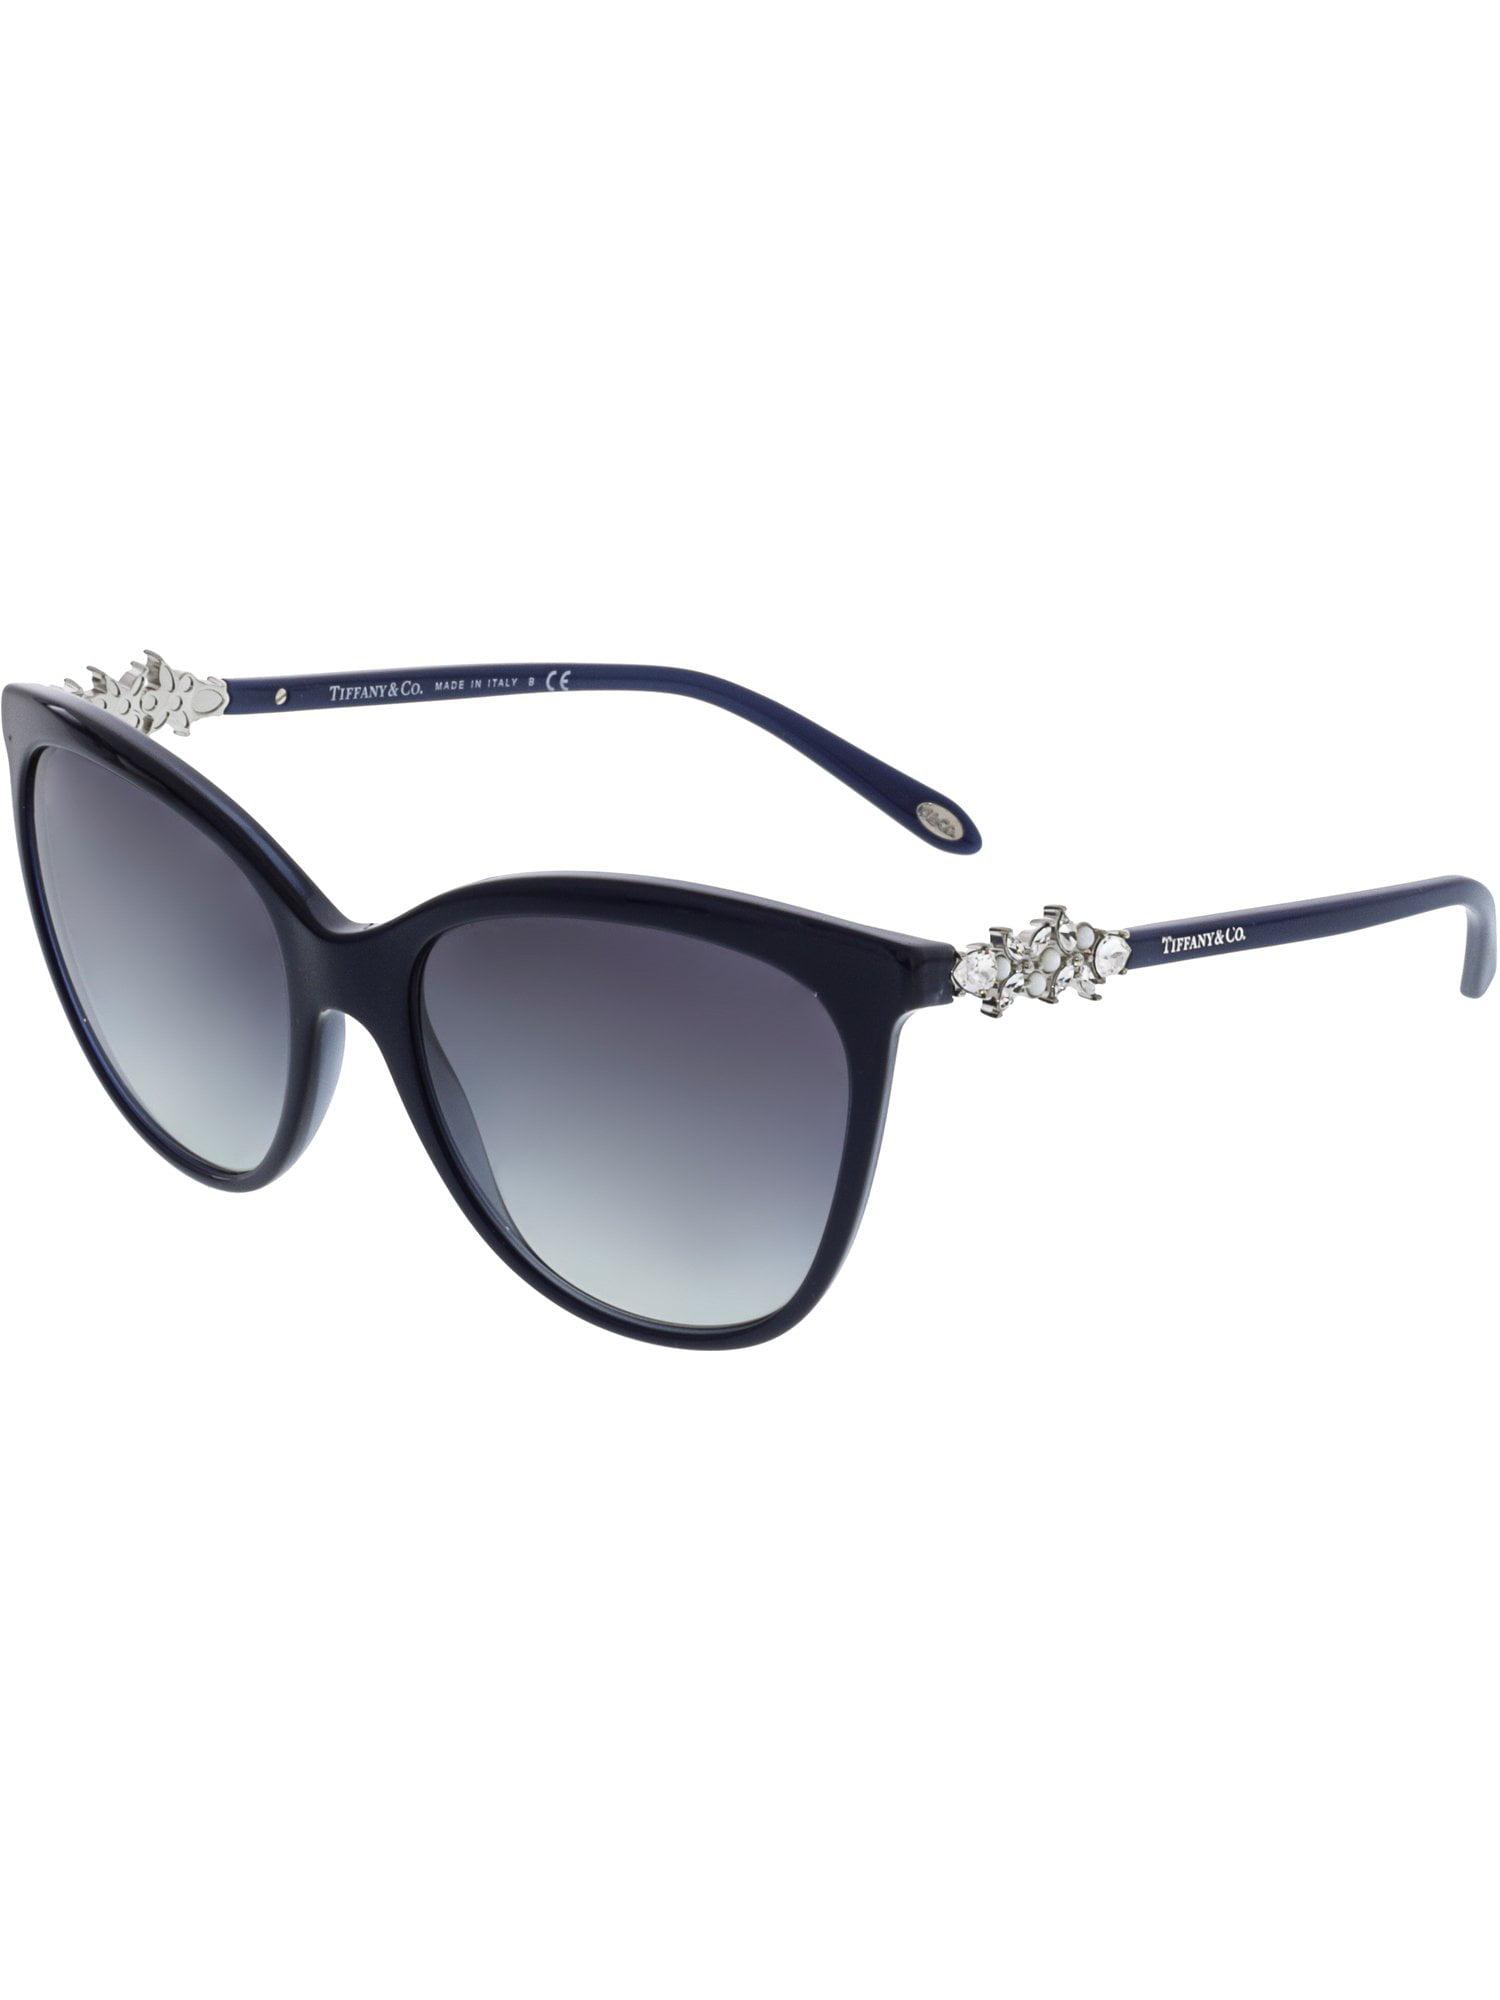 Tiffany & Co Women's Gradient TF4131HB-81913C-56 Blue Rectangle Sunglasses